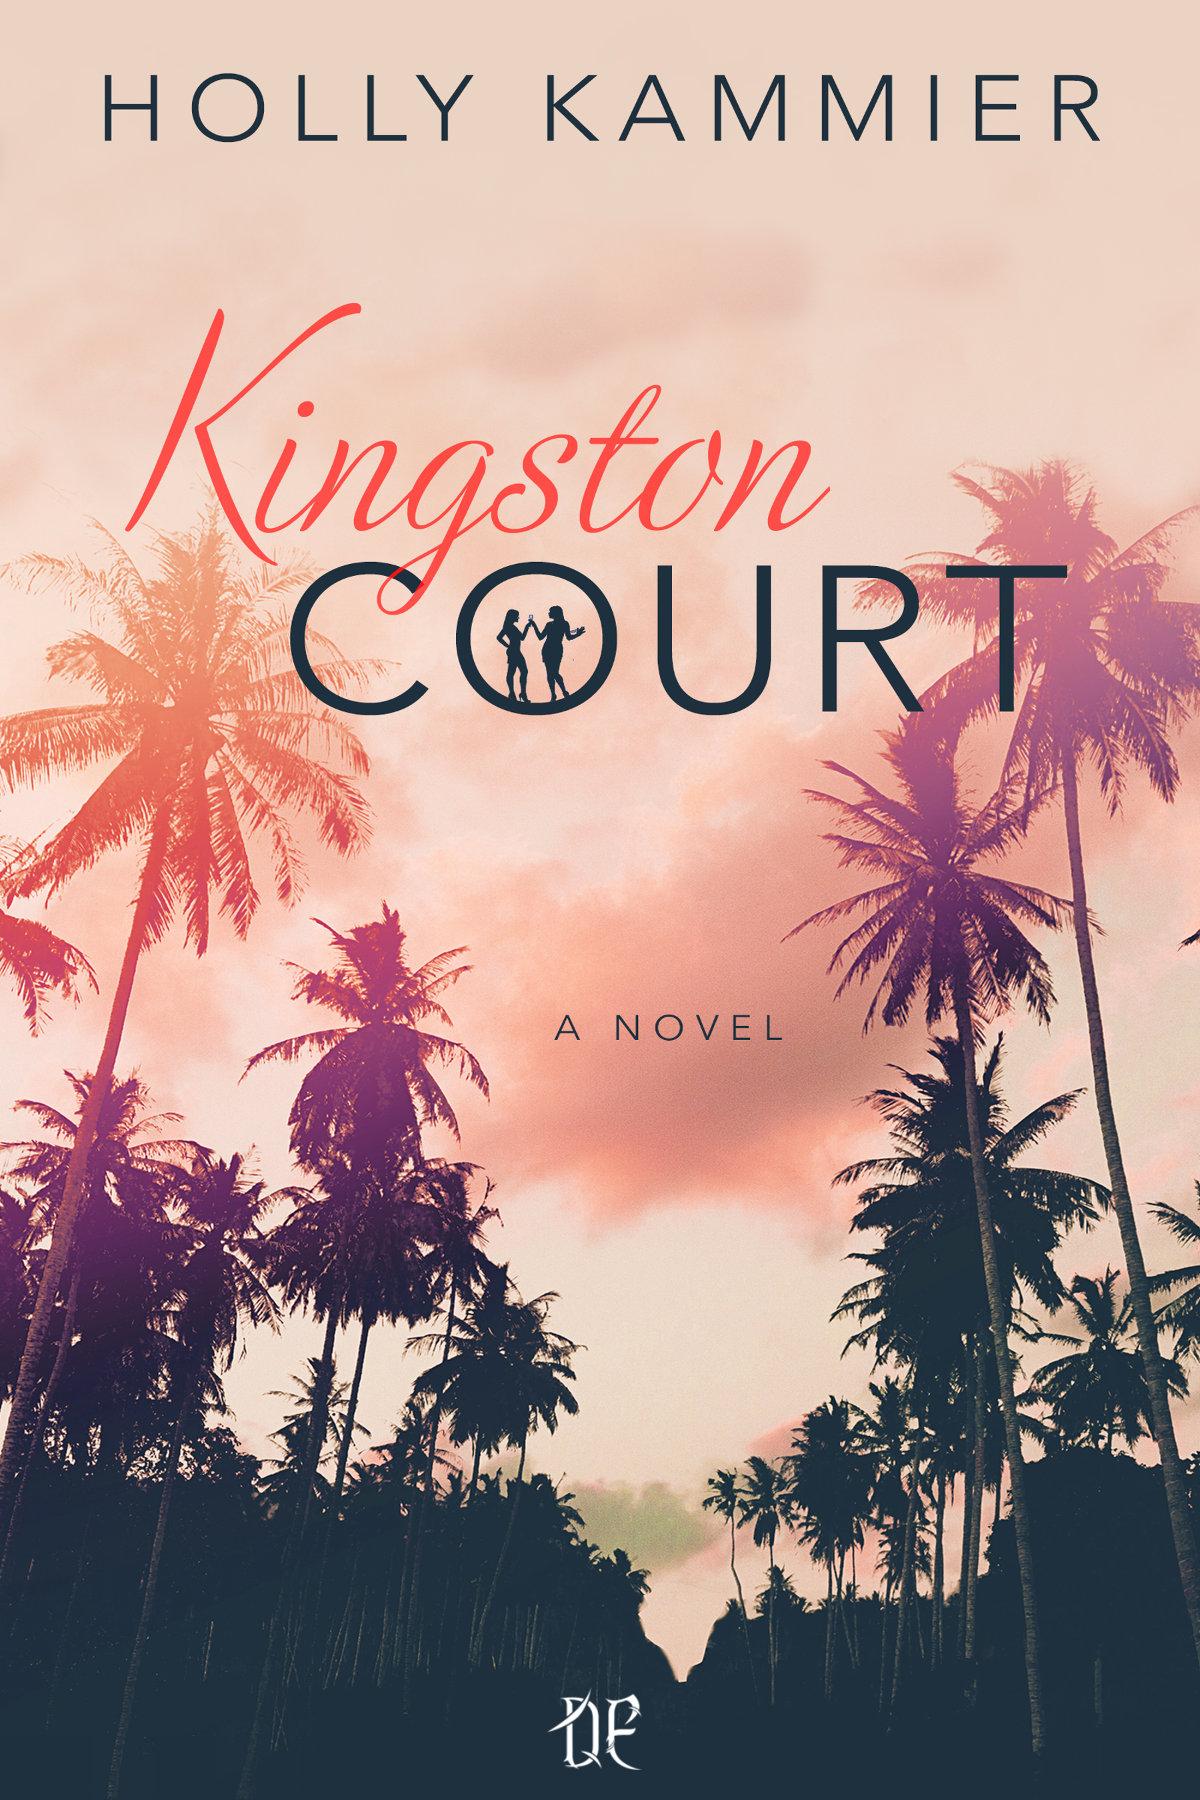 Kingston Court di Holly Kammier